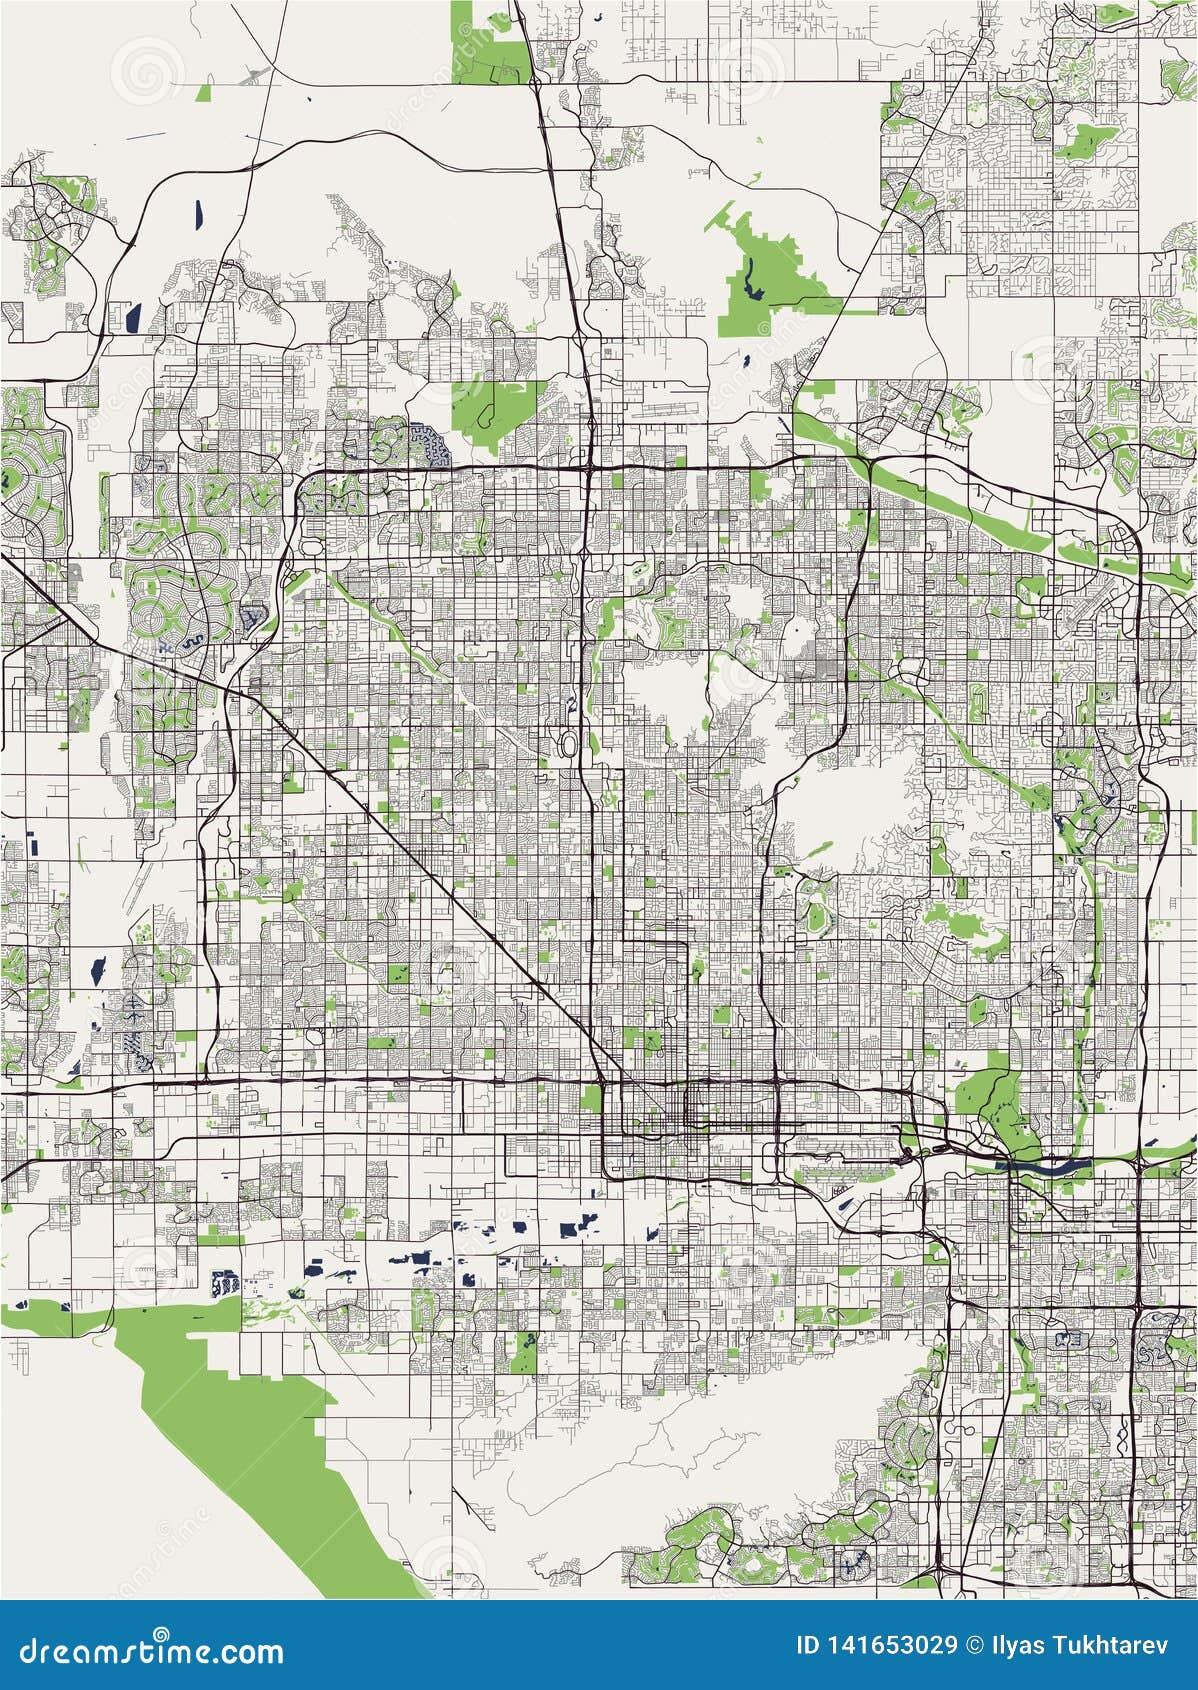 Carte de la ville de Phoenix, Arizona, Etats-Unis